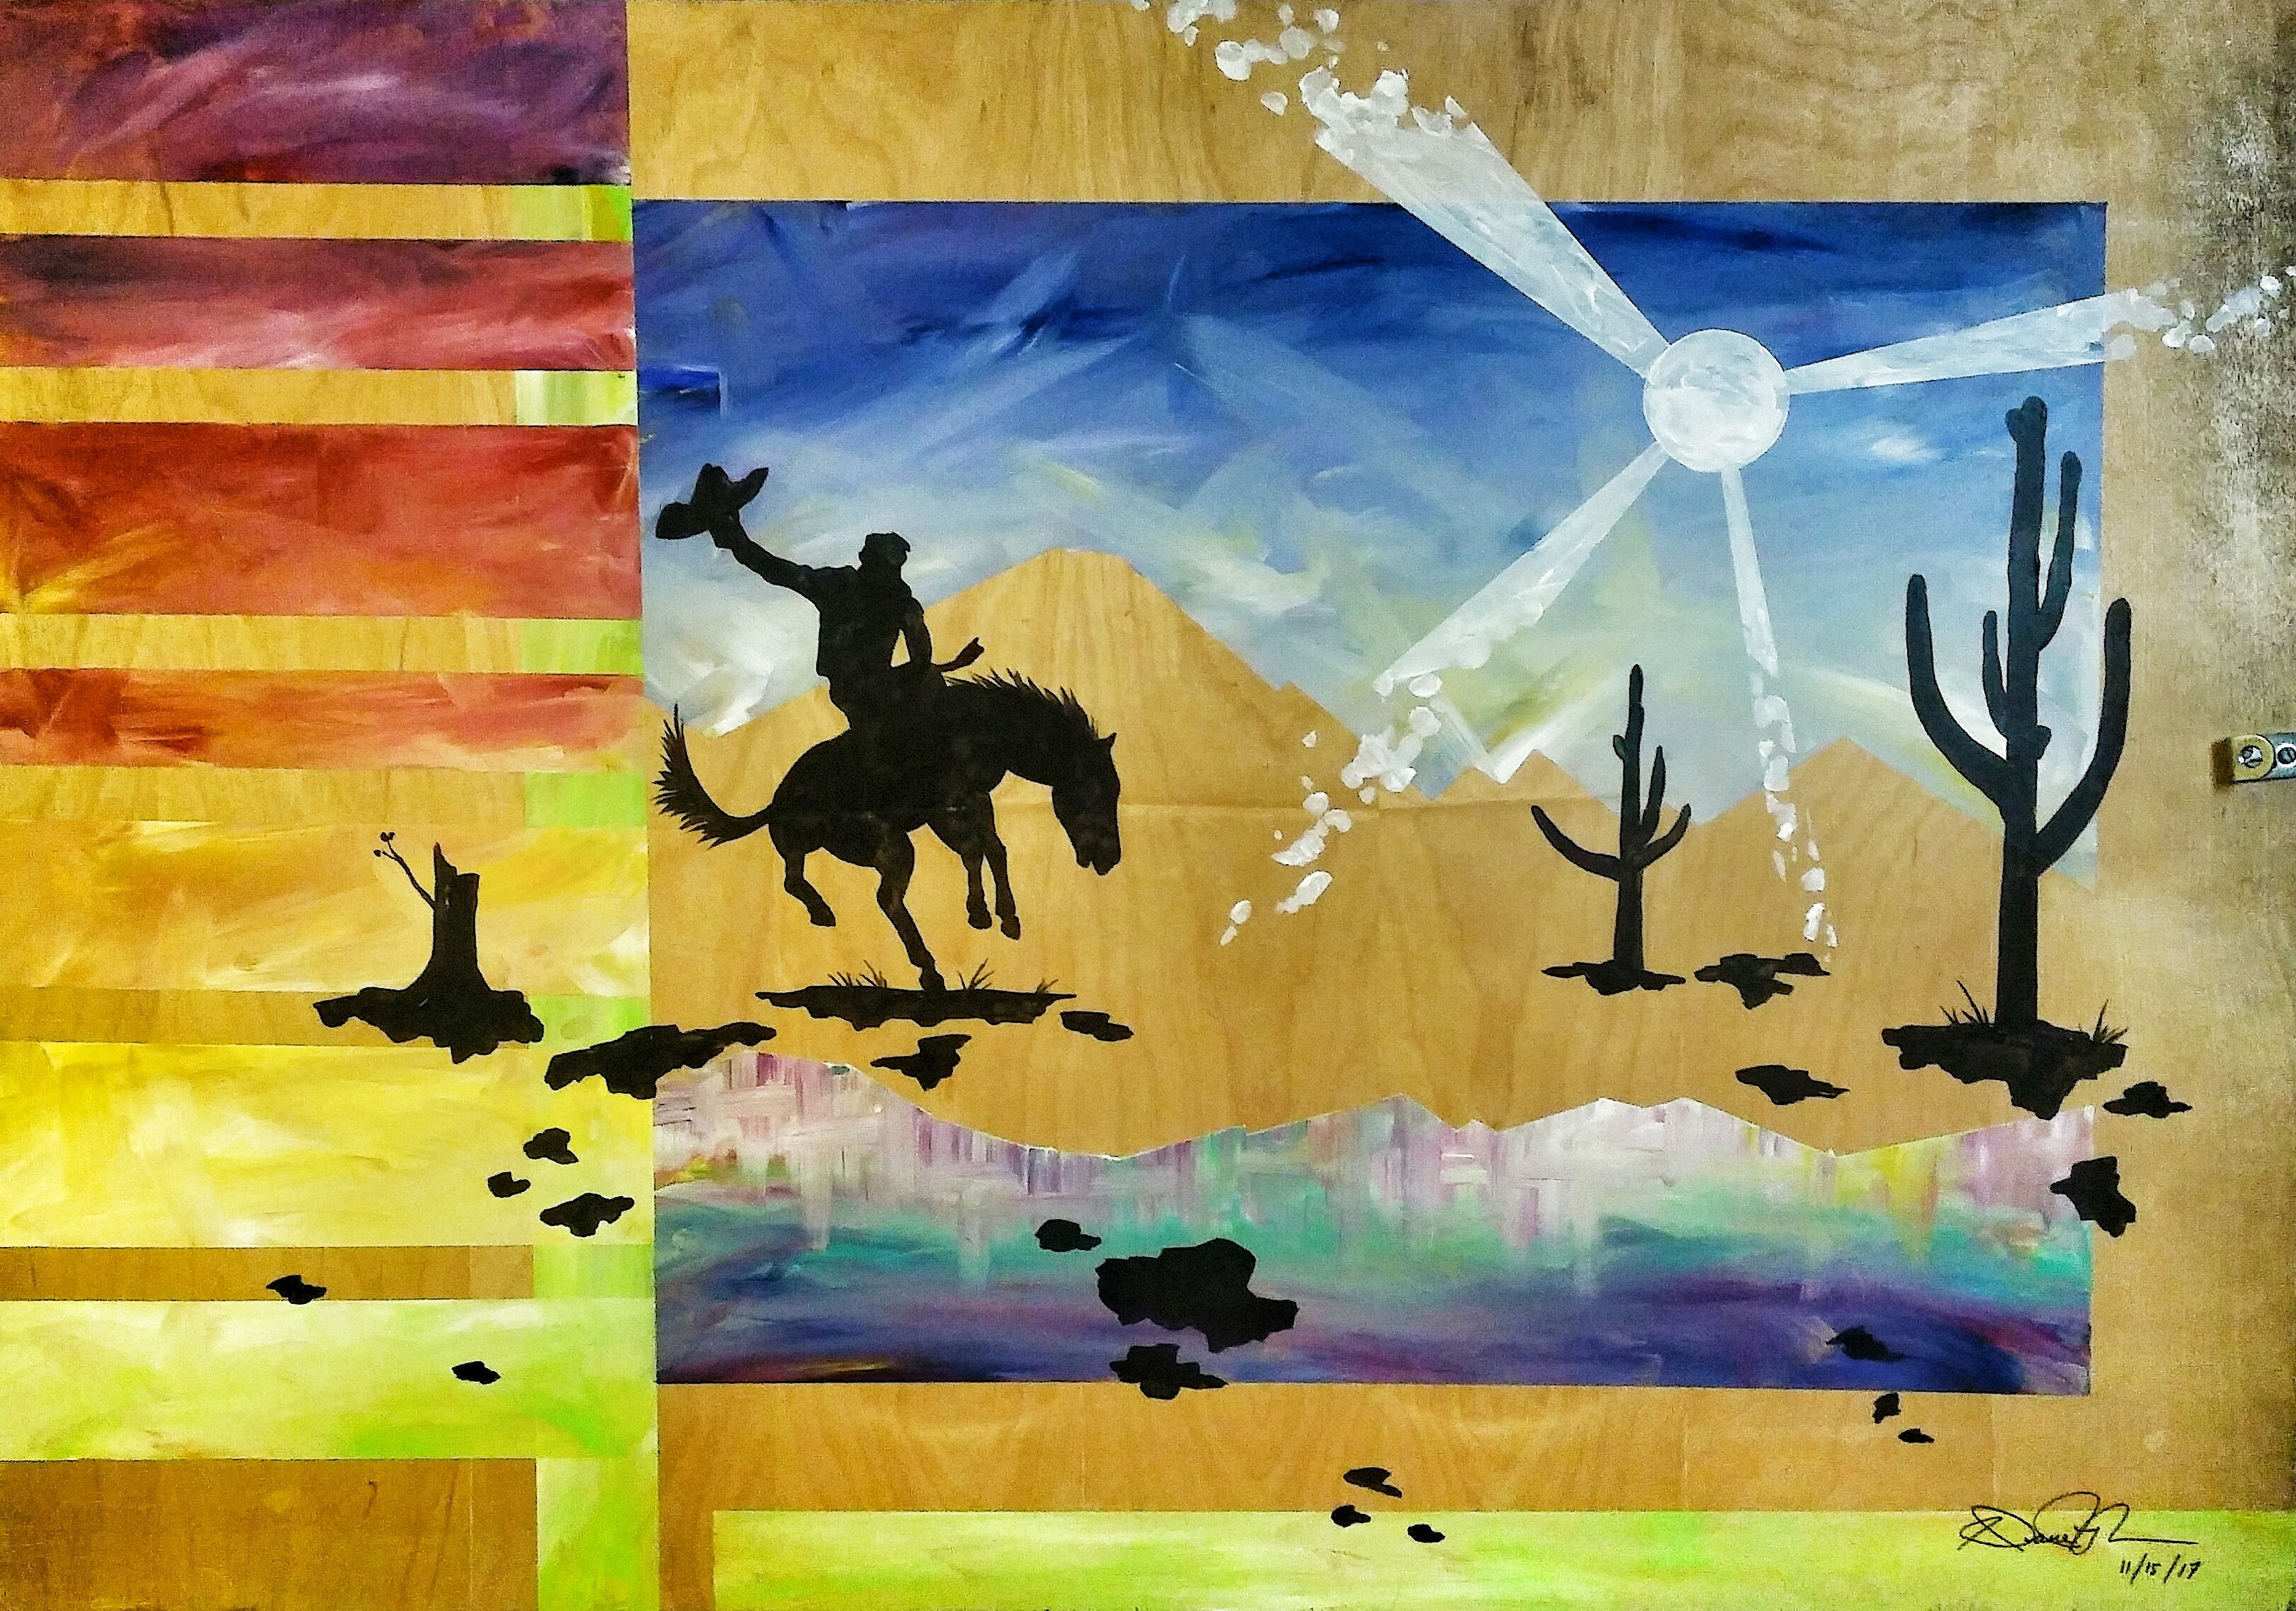 Buckin' Bronc by Dane Hyman | ArtworkNetwork.com